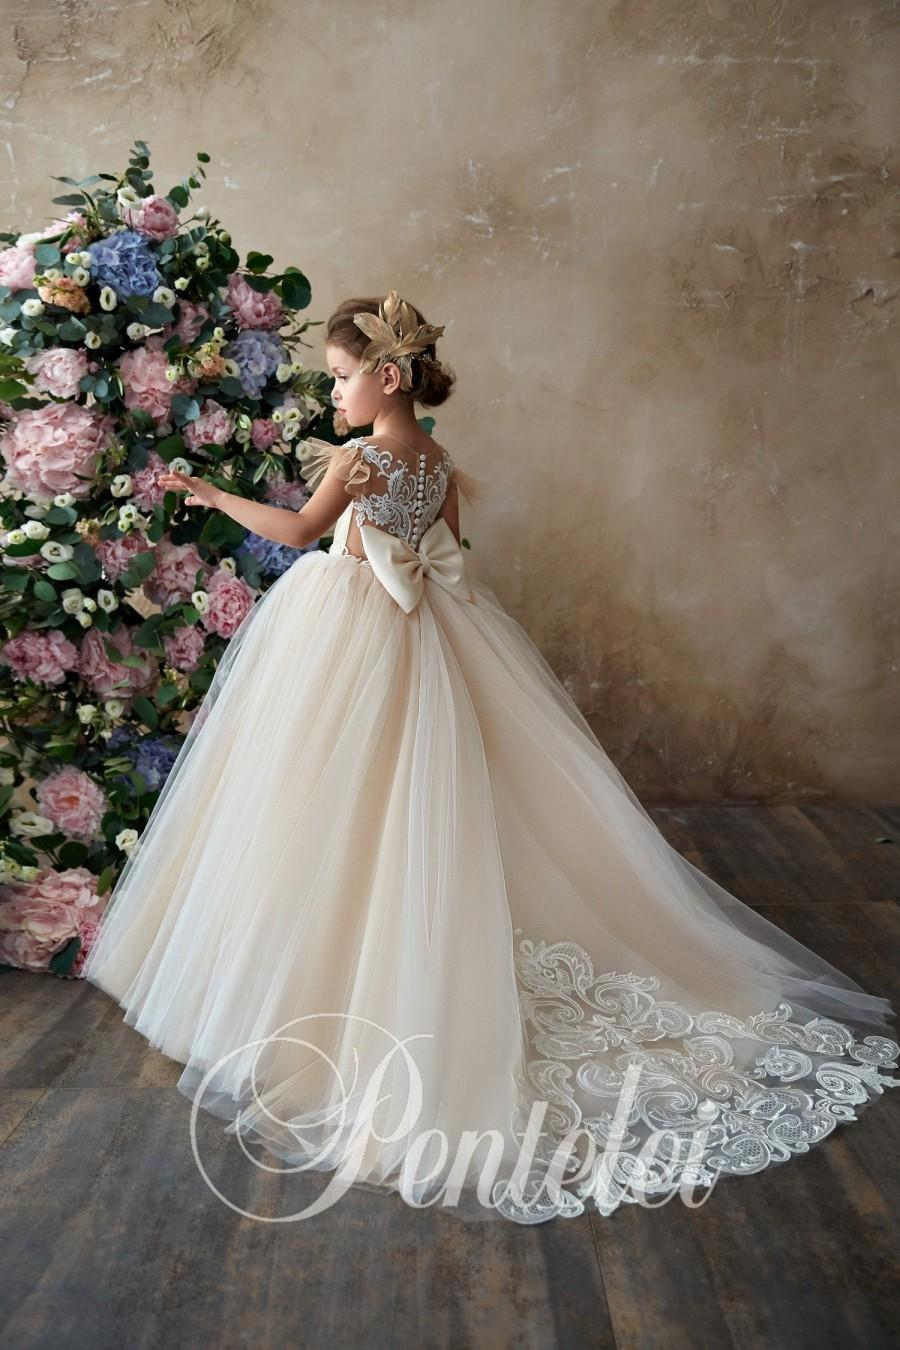 Wedding - First Communion Dress, White flower girl dress, Baptism Dress,Baby toddler lace dress,flower girls dresses,flower girl dress